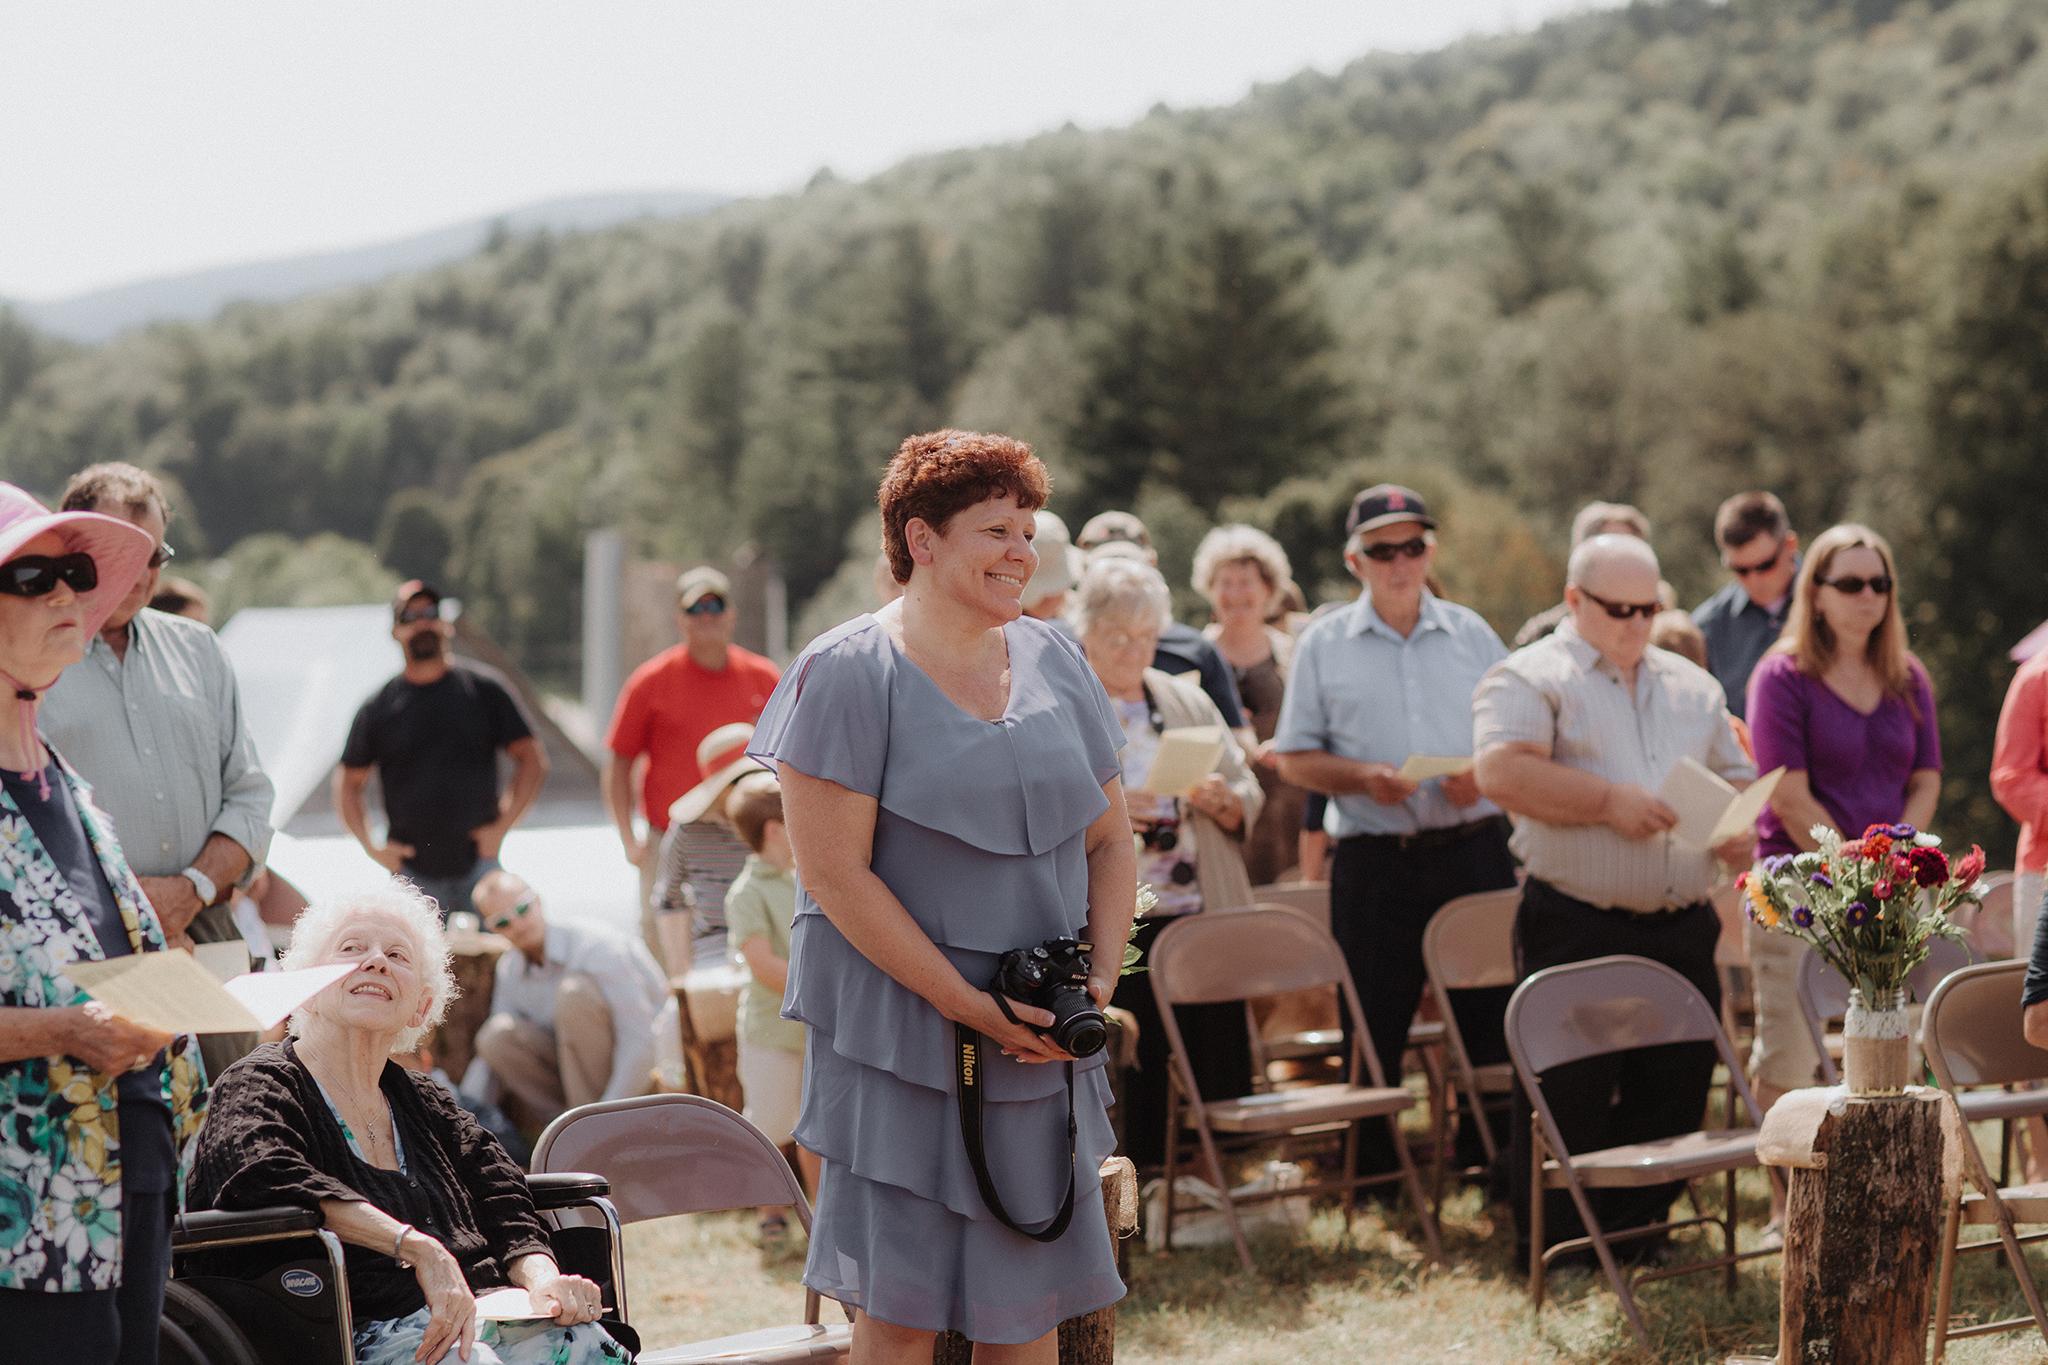 vermont-wedding-photographer-outdoor-farm-wedding-10.jpg